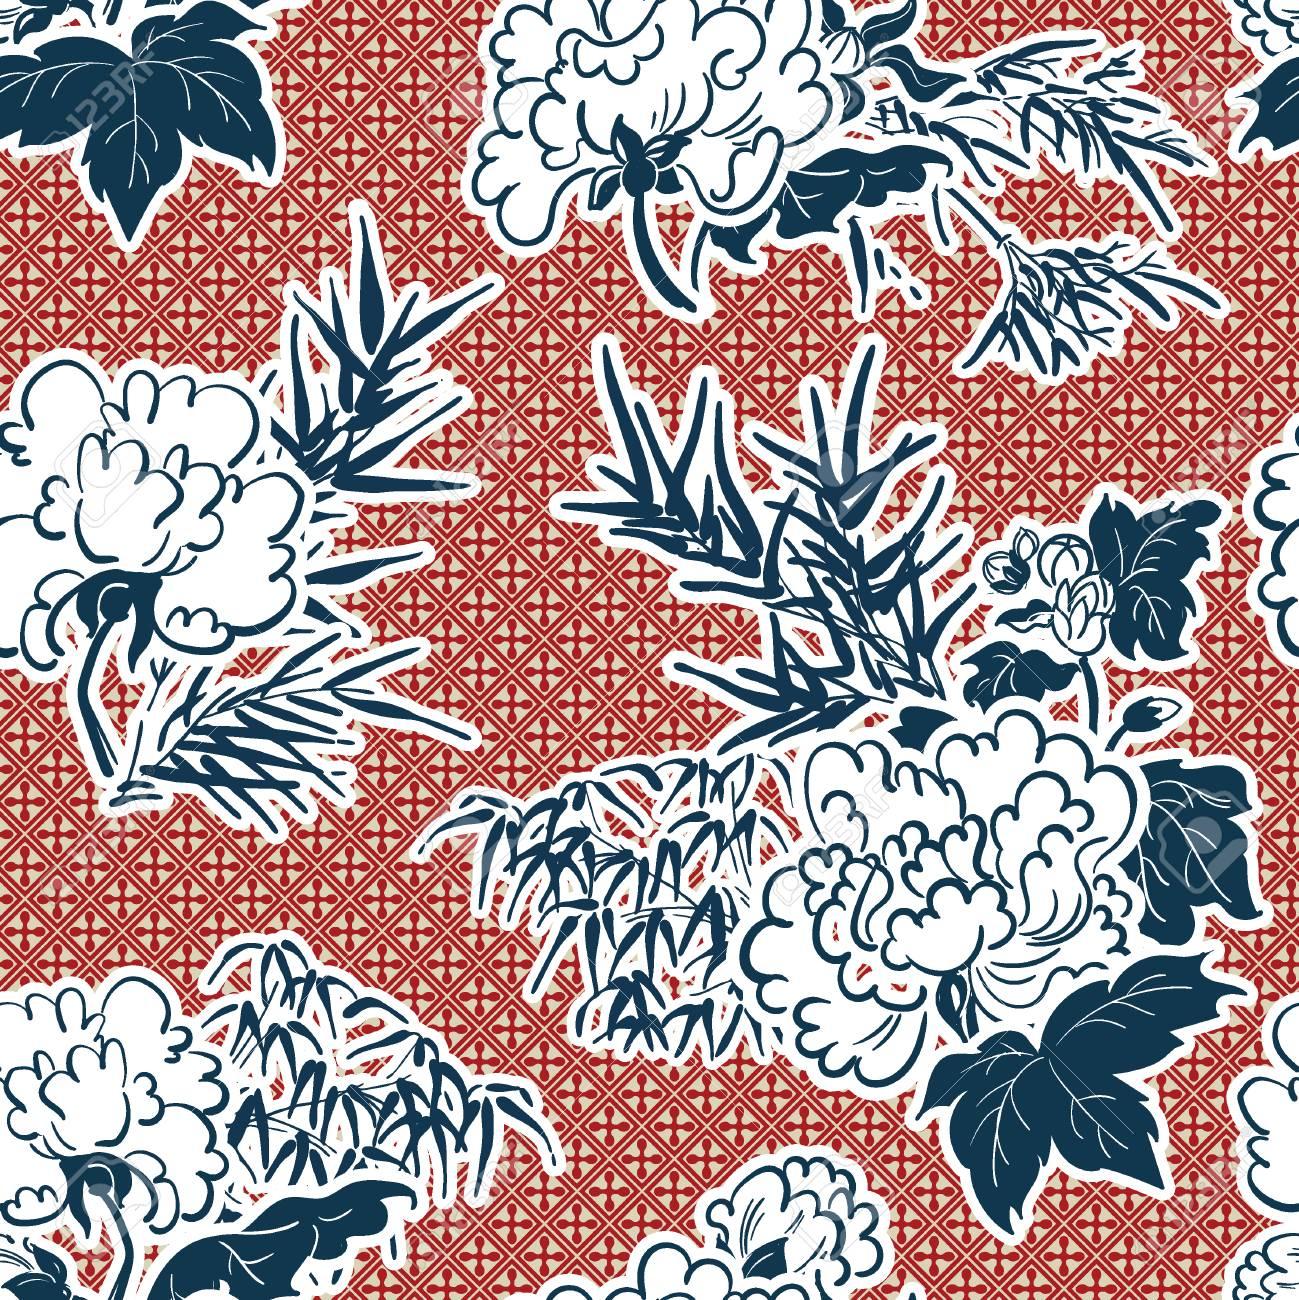 japanese traditional vector illustration peony pattern - 120440872